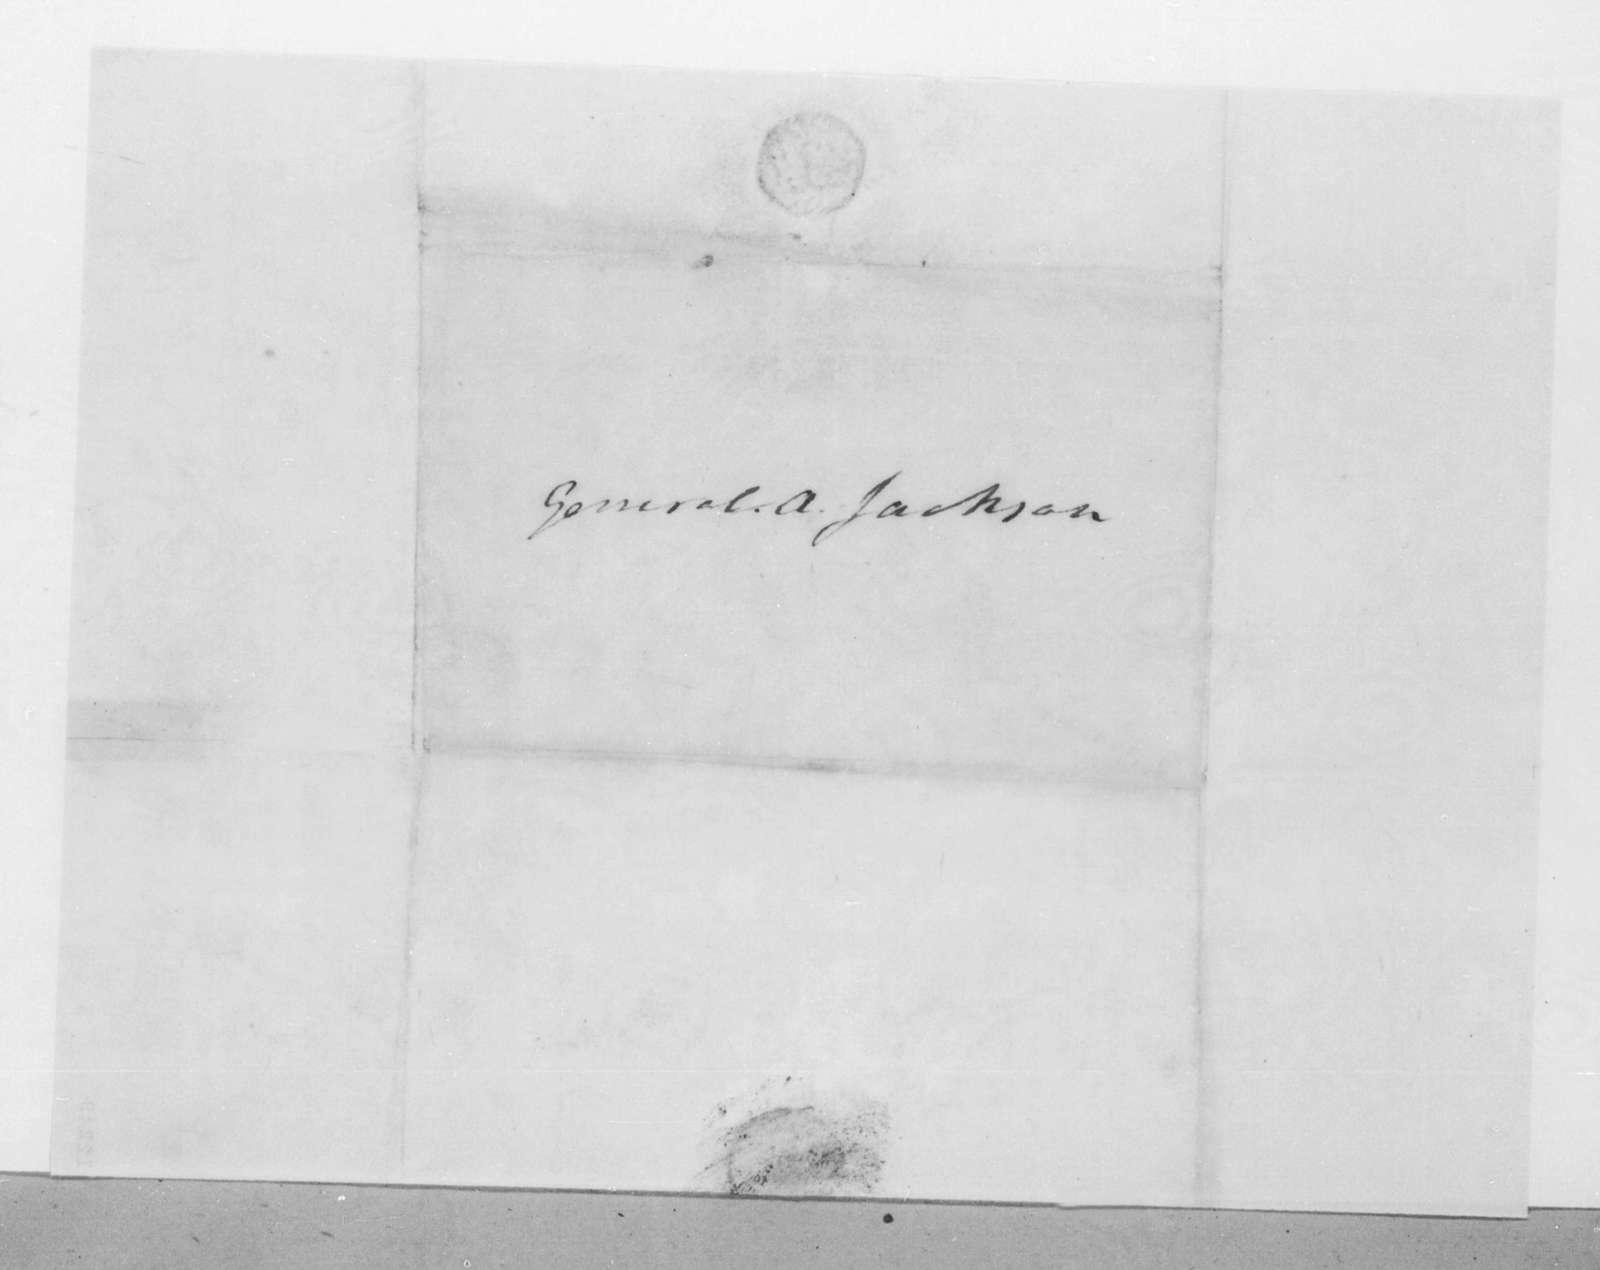 James Monroe to Andrew Jackson, February 26, 1825